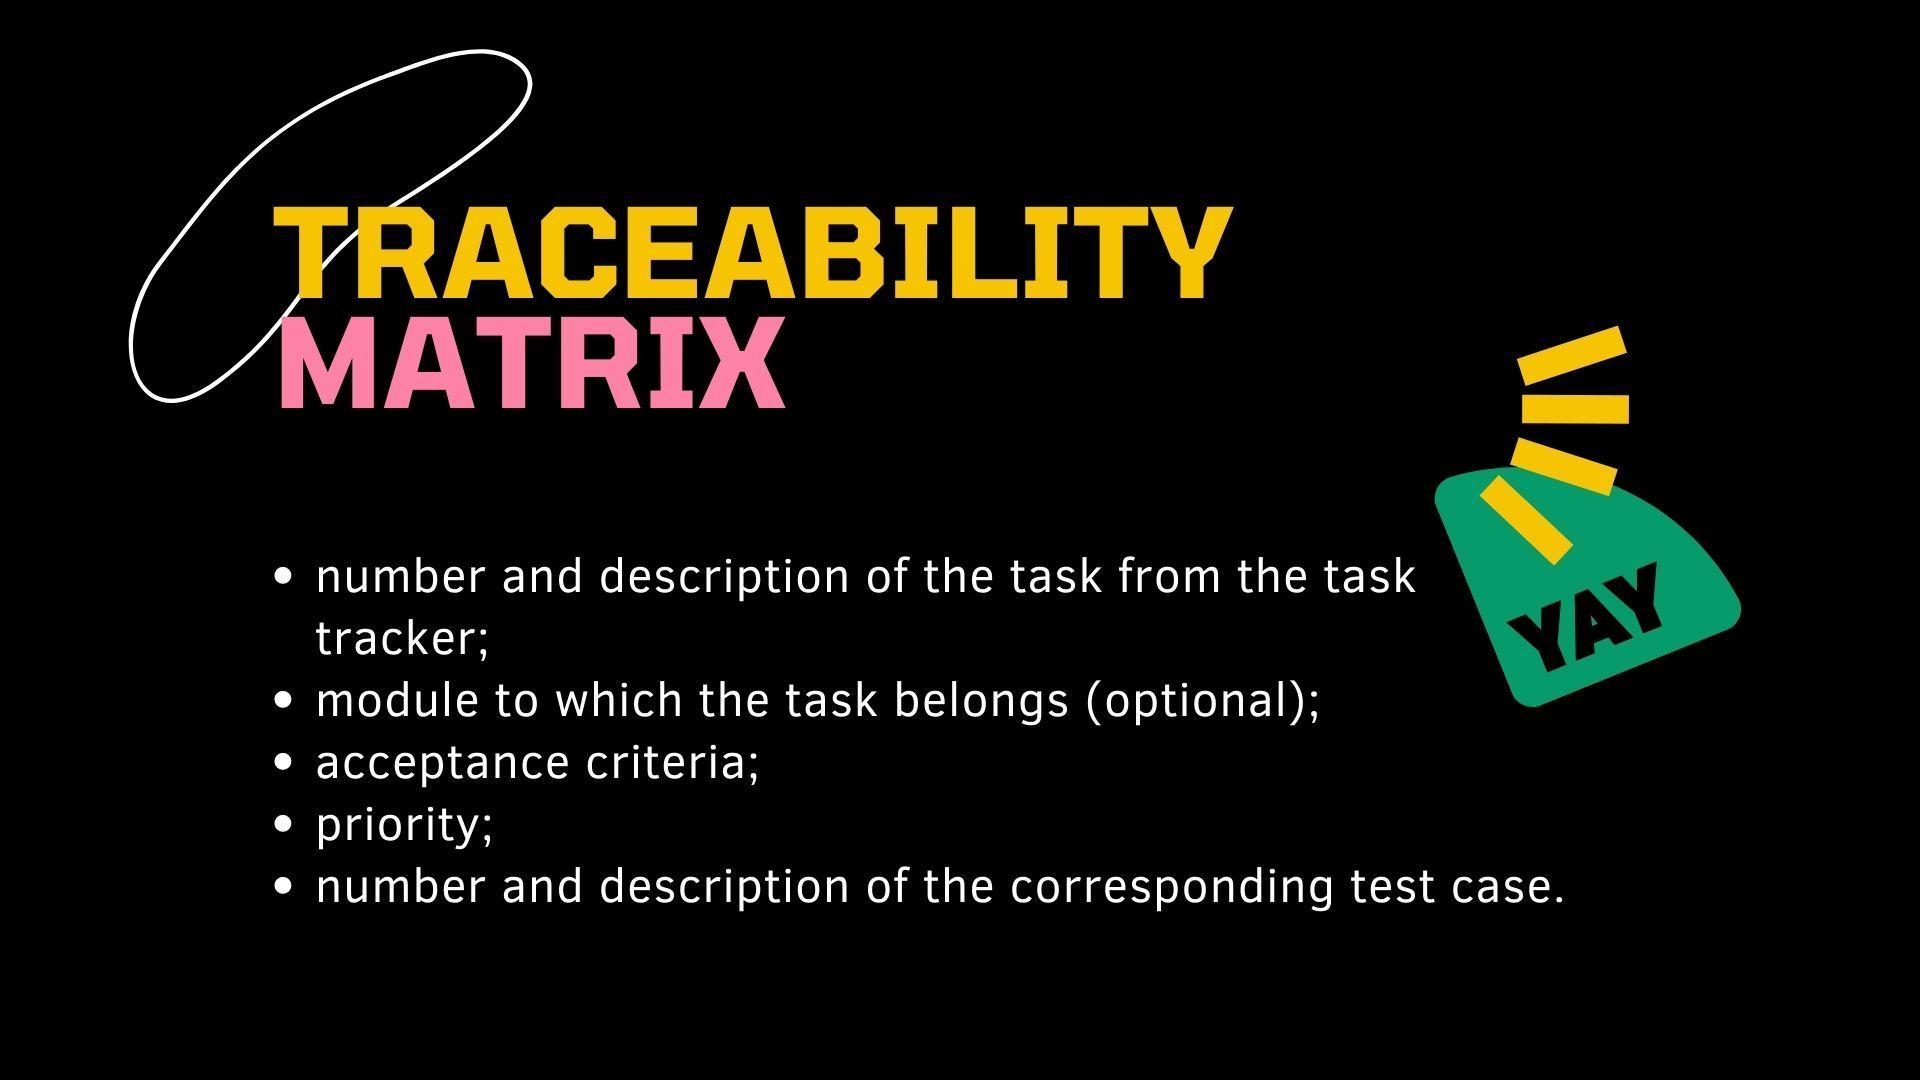 Traceability Matrix